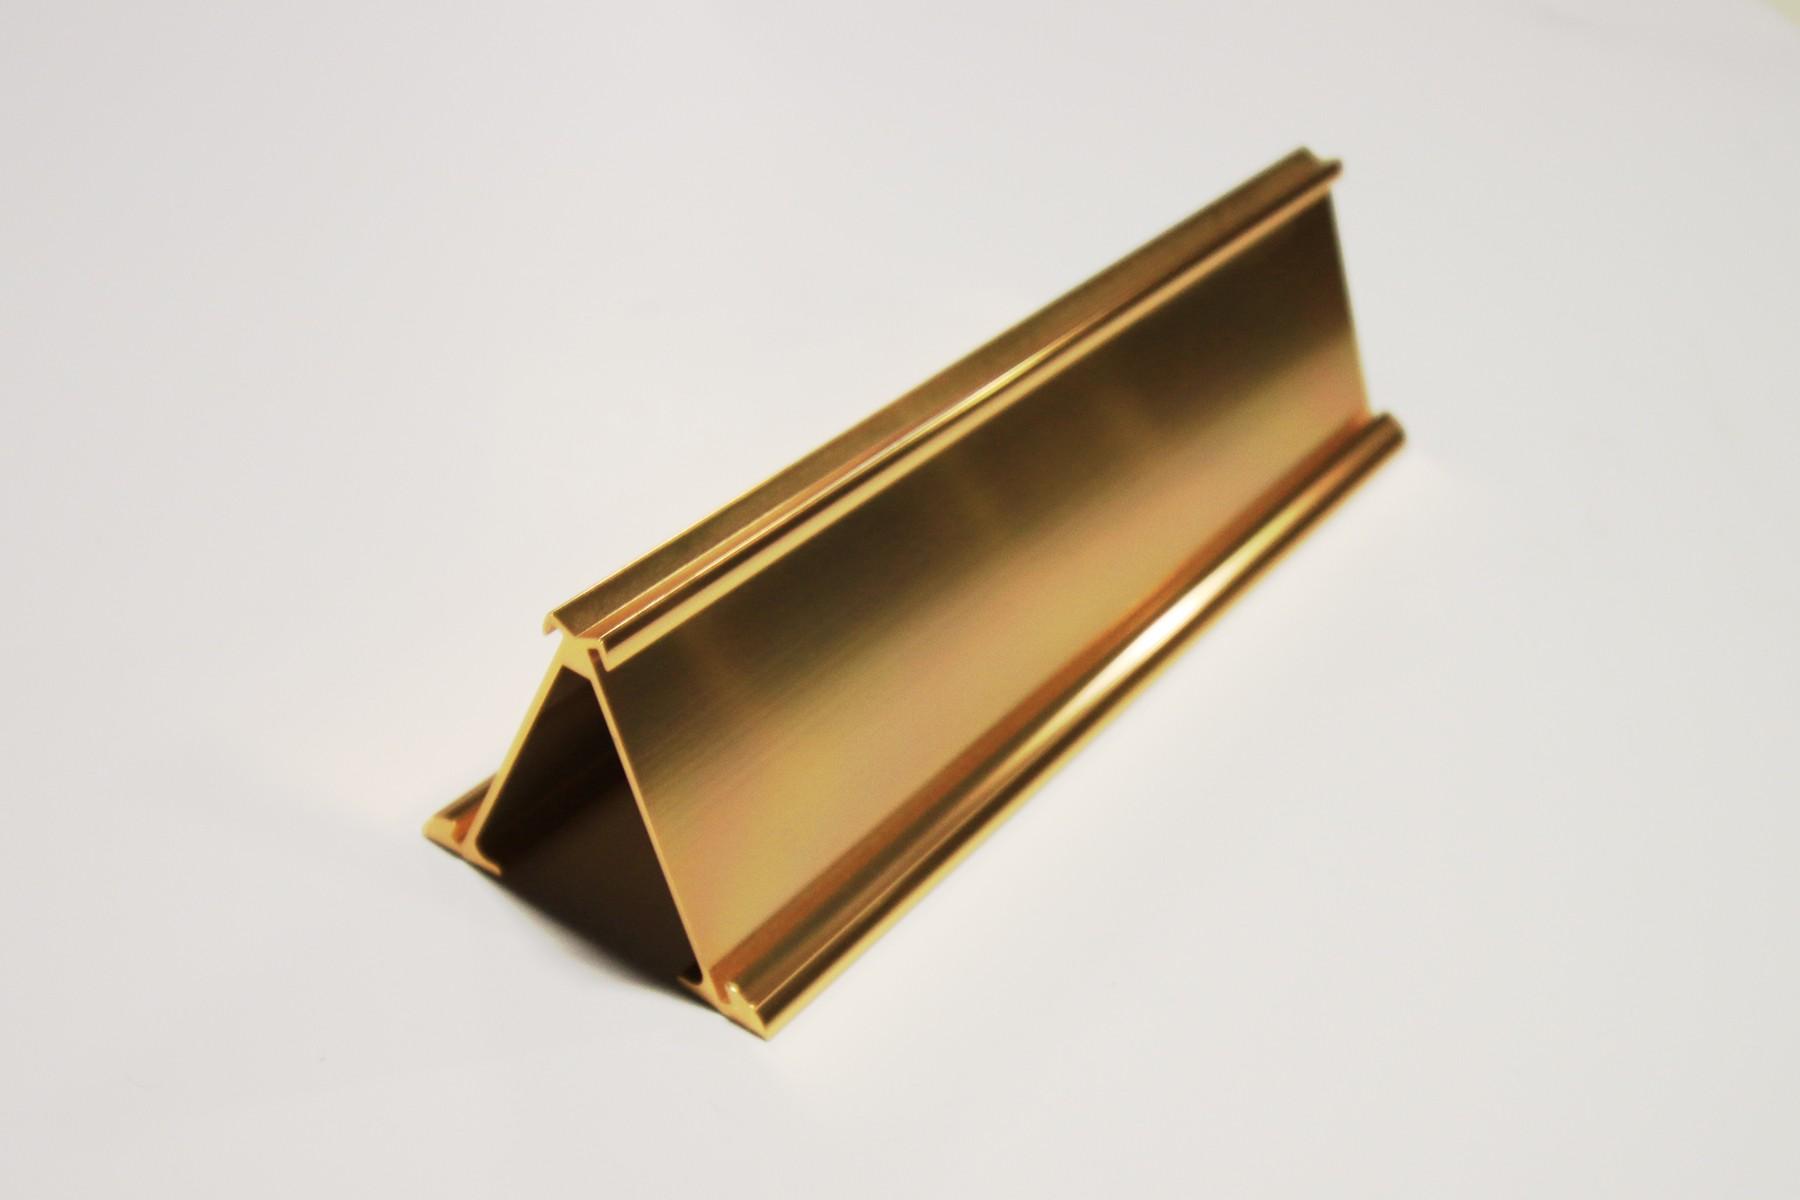 2 x 8 2-Sided Desk Holder, Gold